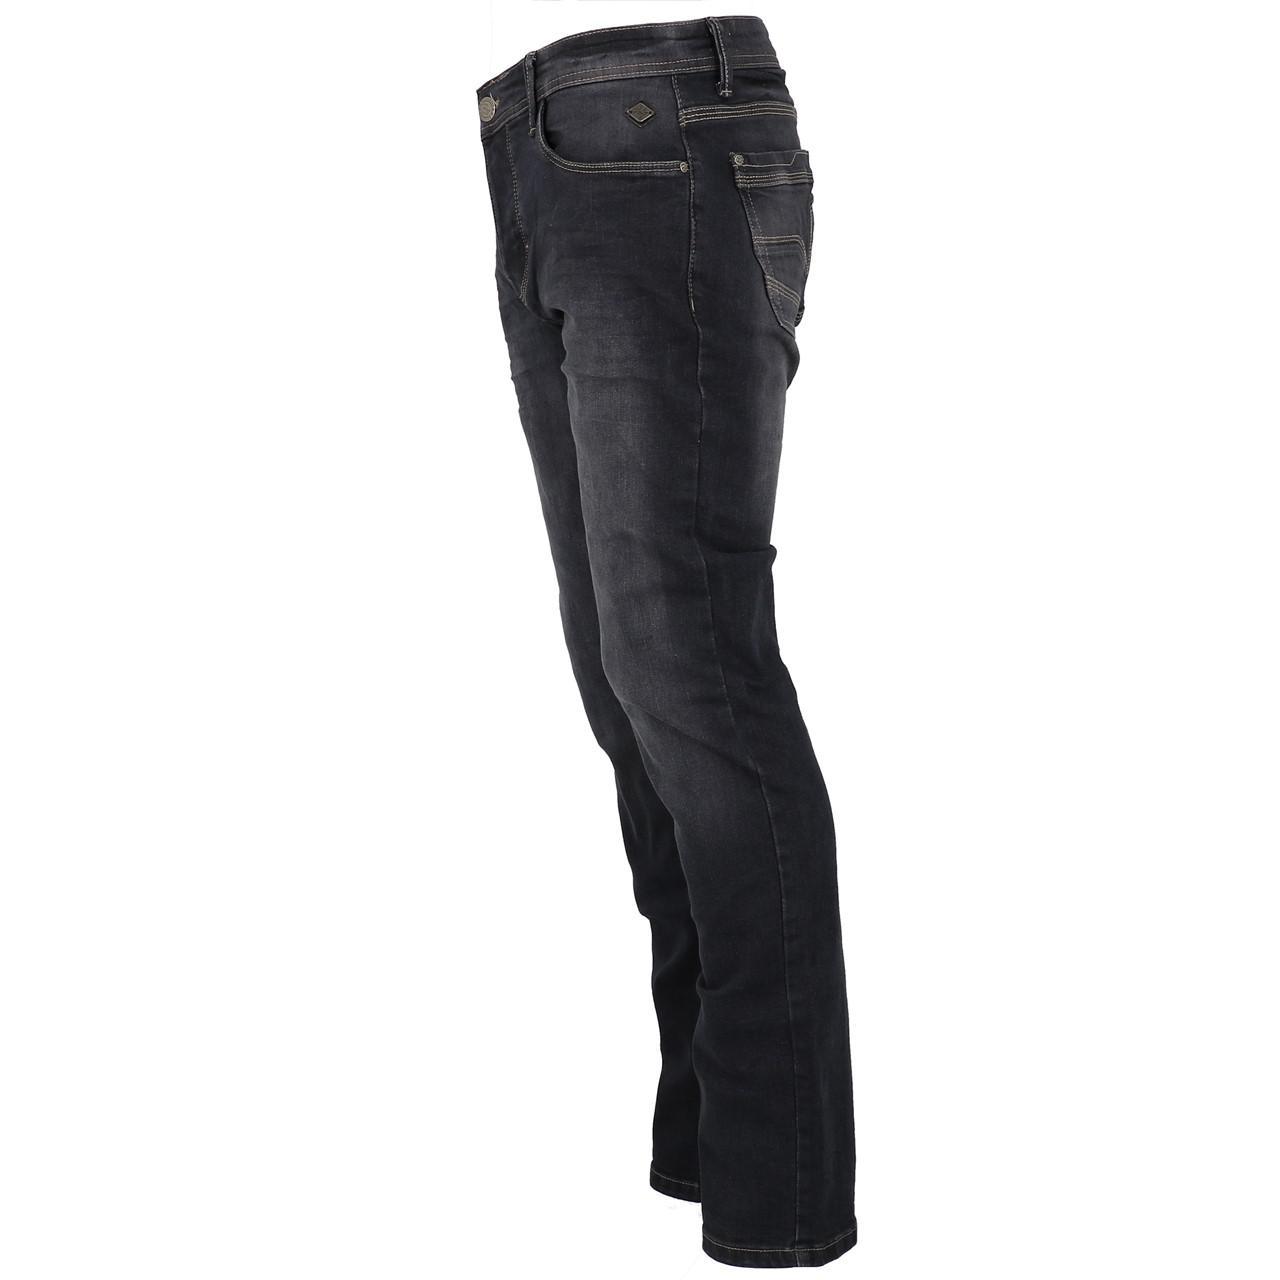 Jeans-Pants-RMS-26-Jeans-Grey-Blue-Regular-Blue-27122-New thumbnail 2